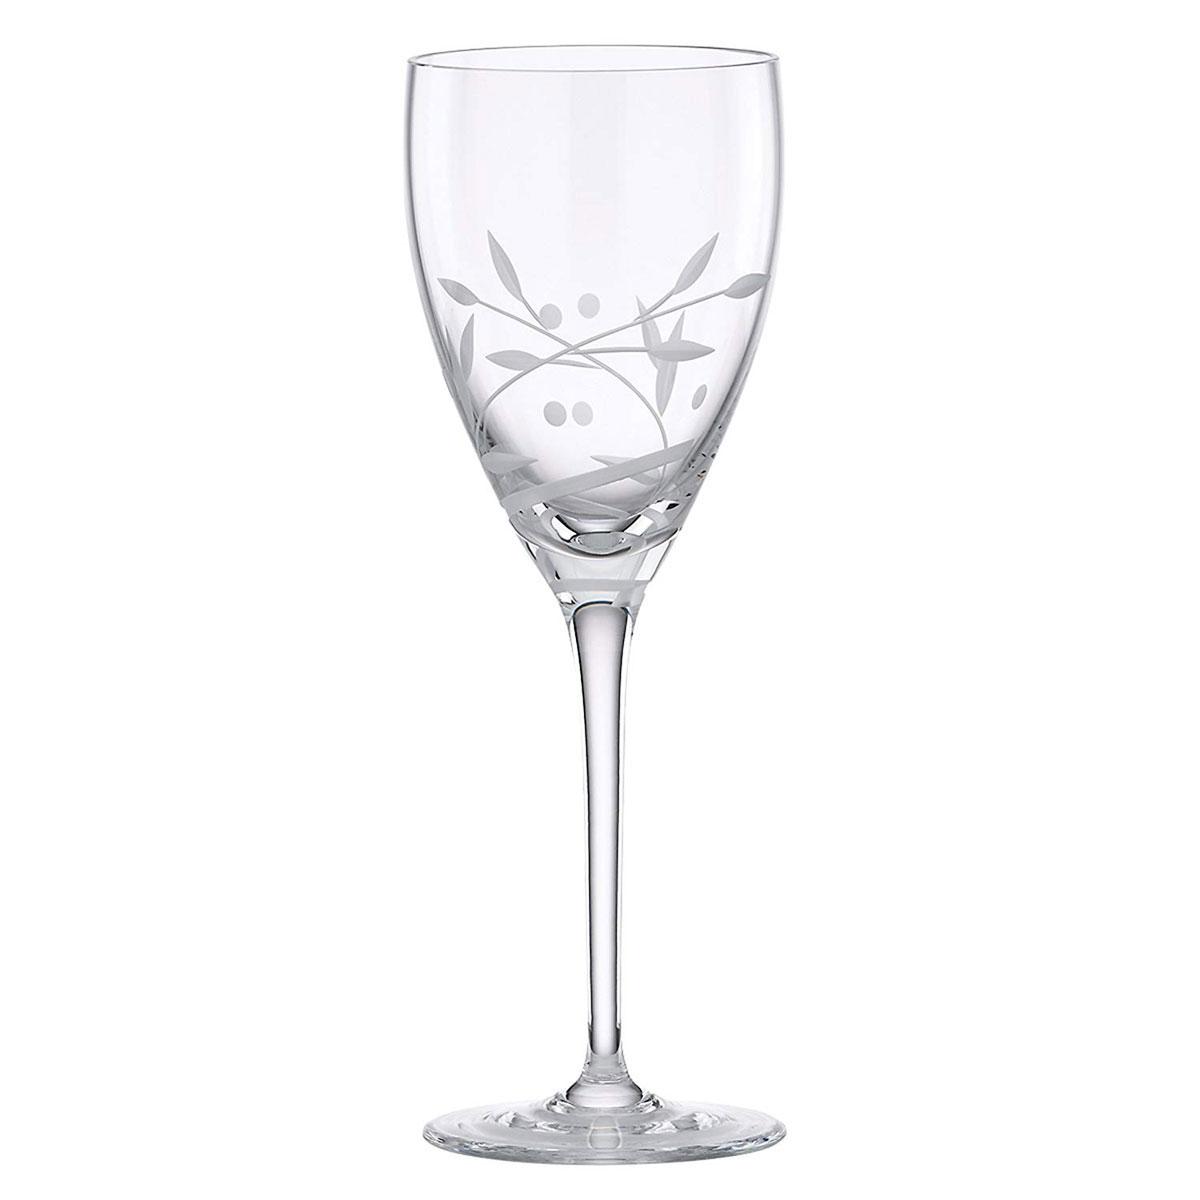 Lenox Opal Innocence Signature Wine, Single